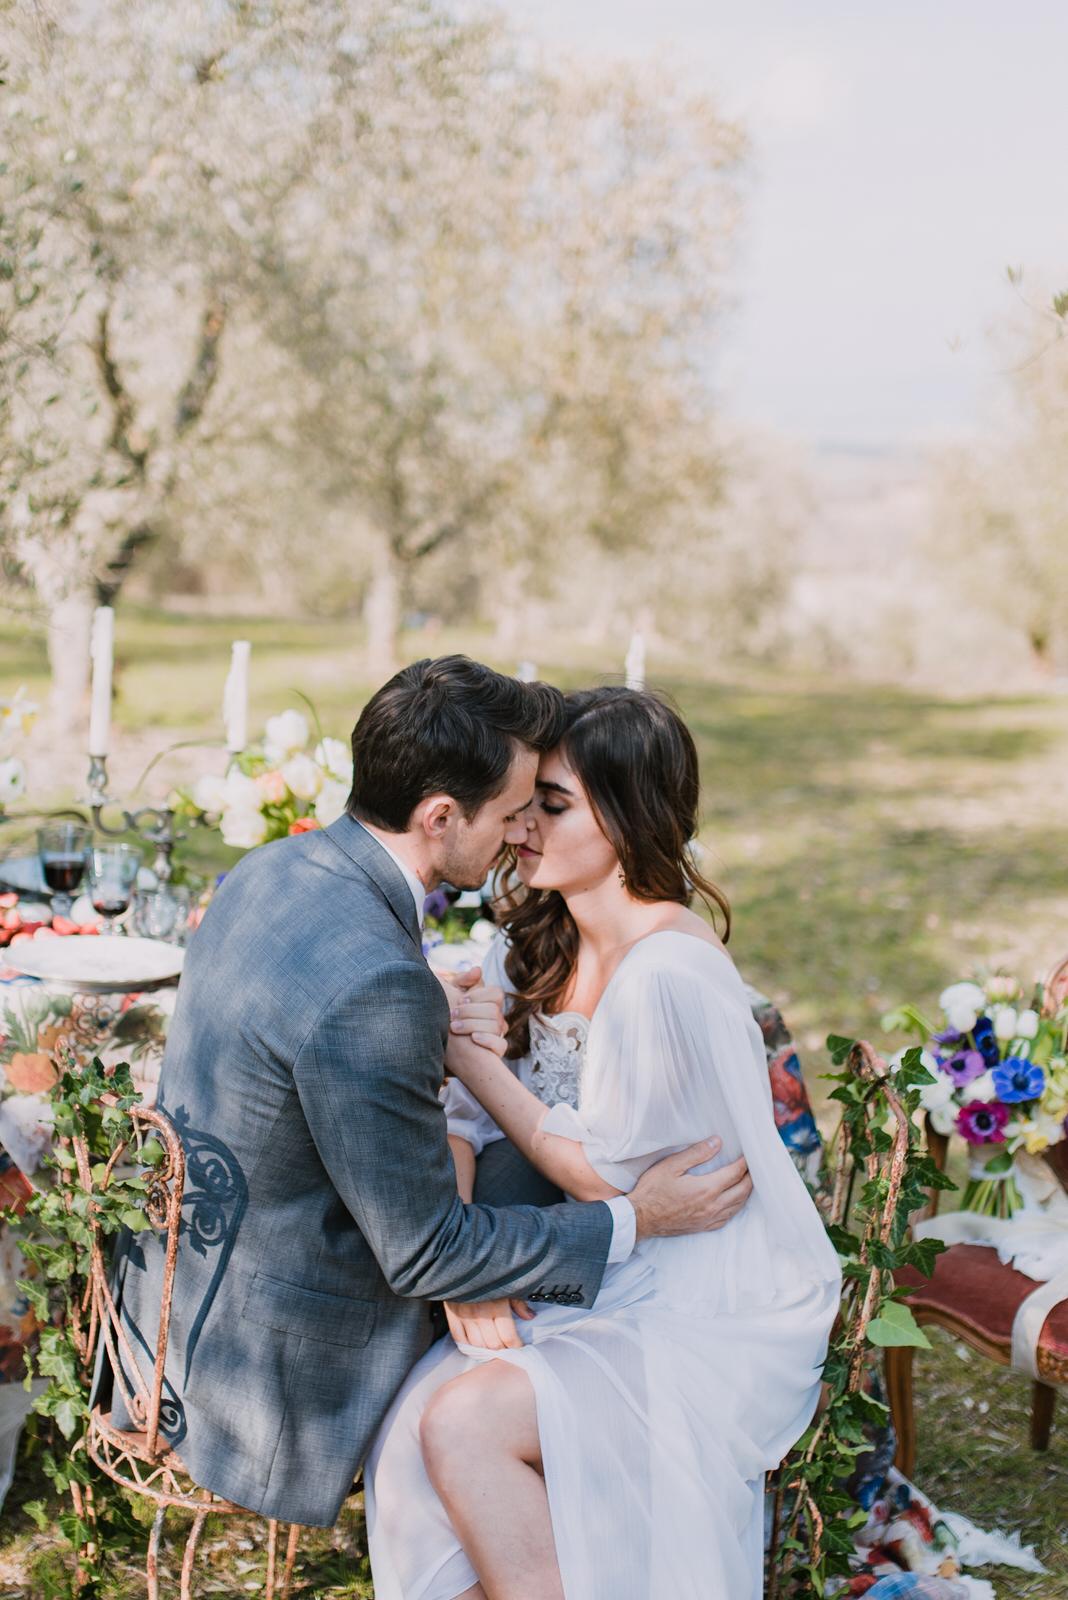 tuscany wedding photography 28.jpg